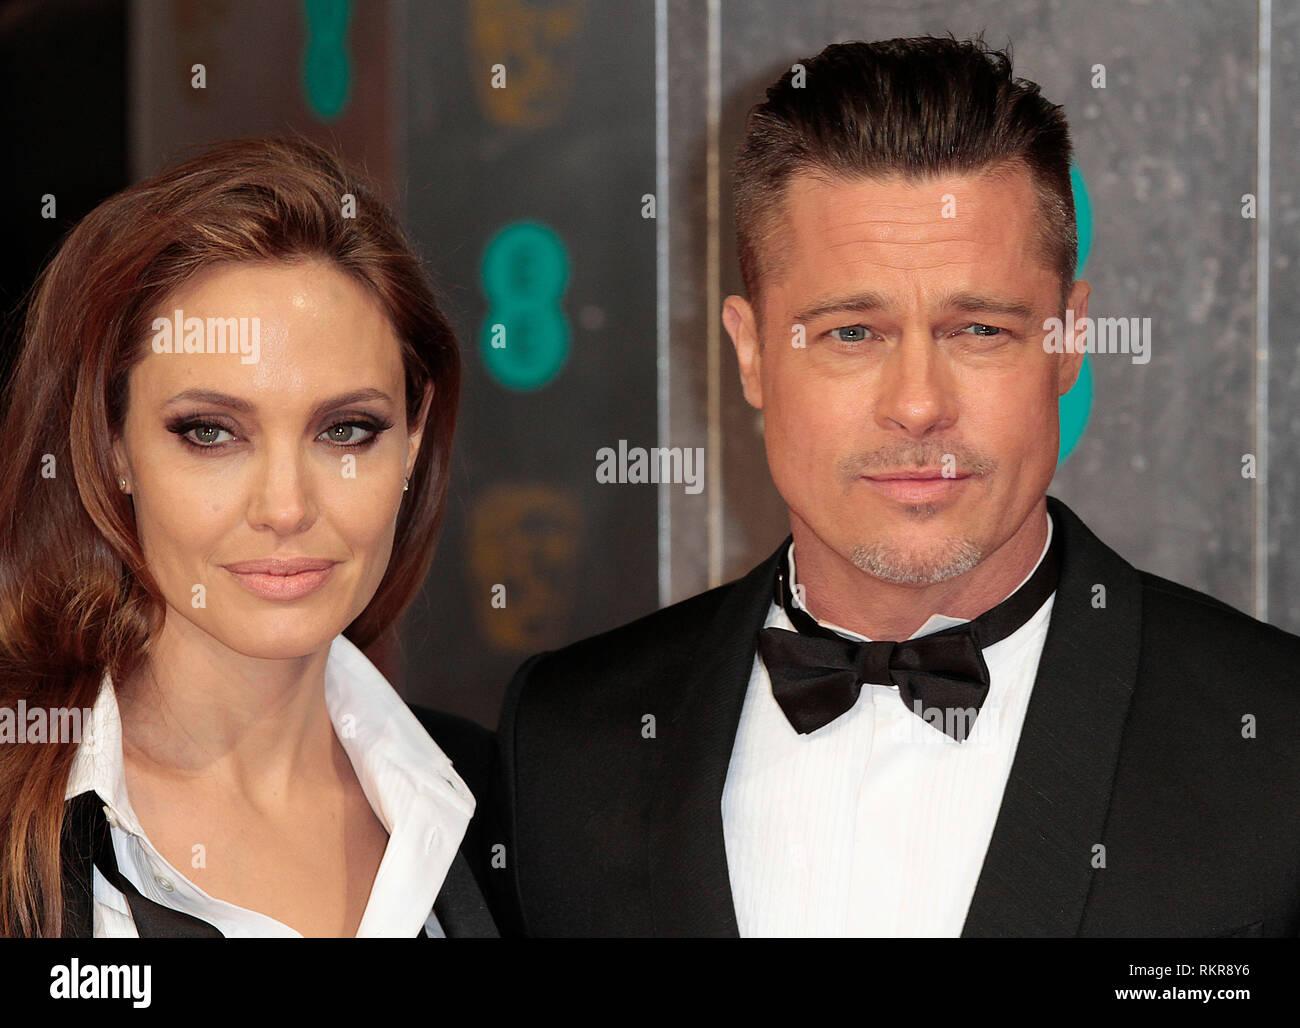 Angelina Jolie and Brad Pitt arrive at the 2014 British Academy Film Awards (BAFTA) at The Royal Opera House, Covent Garden Stock Photo